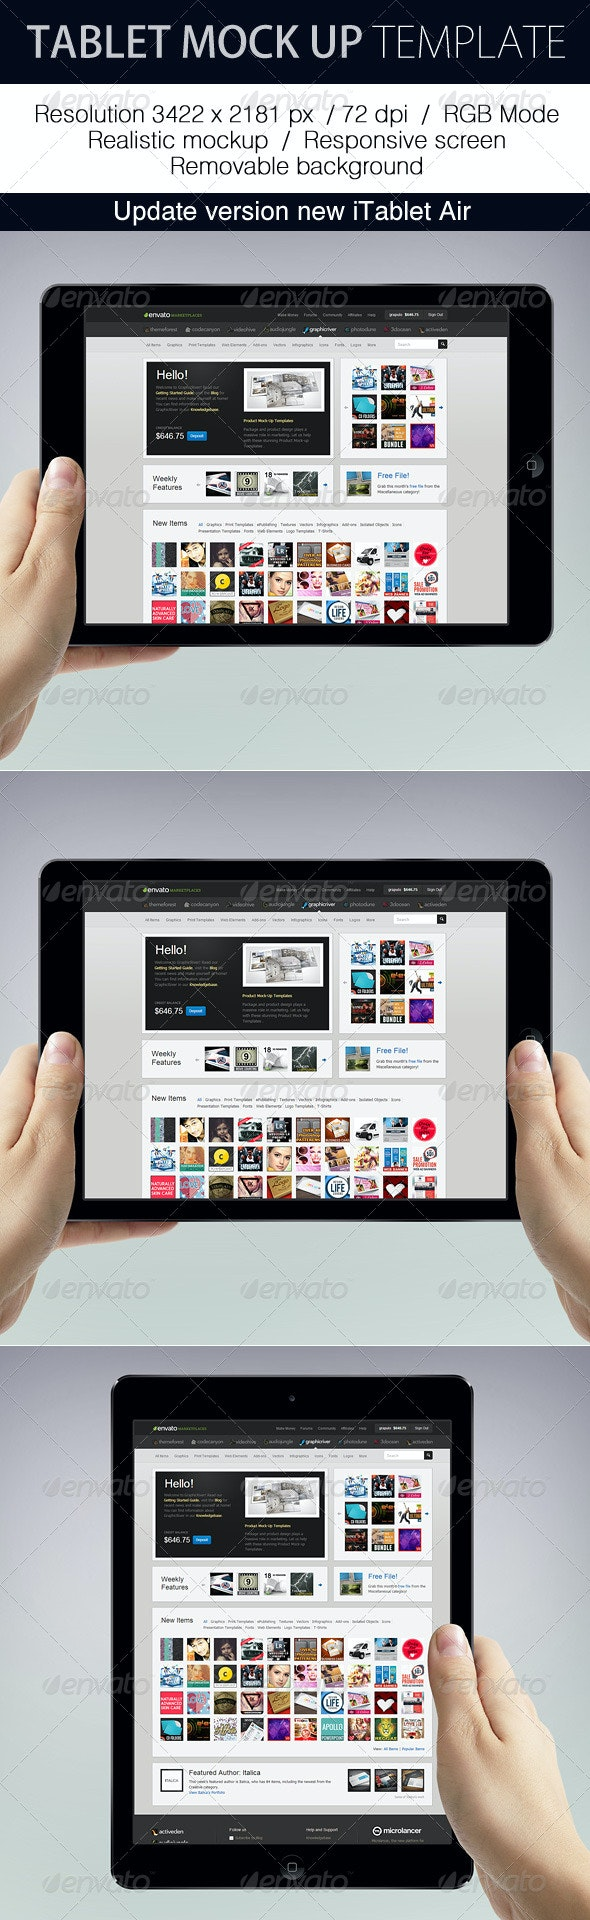 Tablet Mockup Template - Product Mock-Ups Graphics